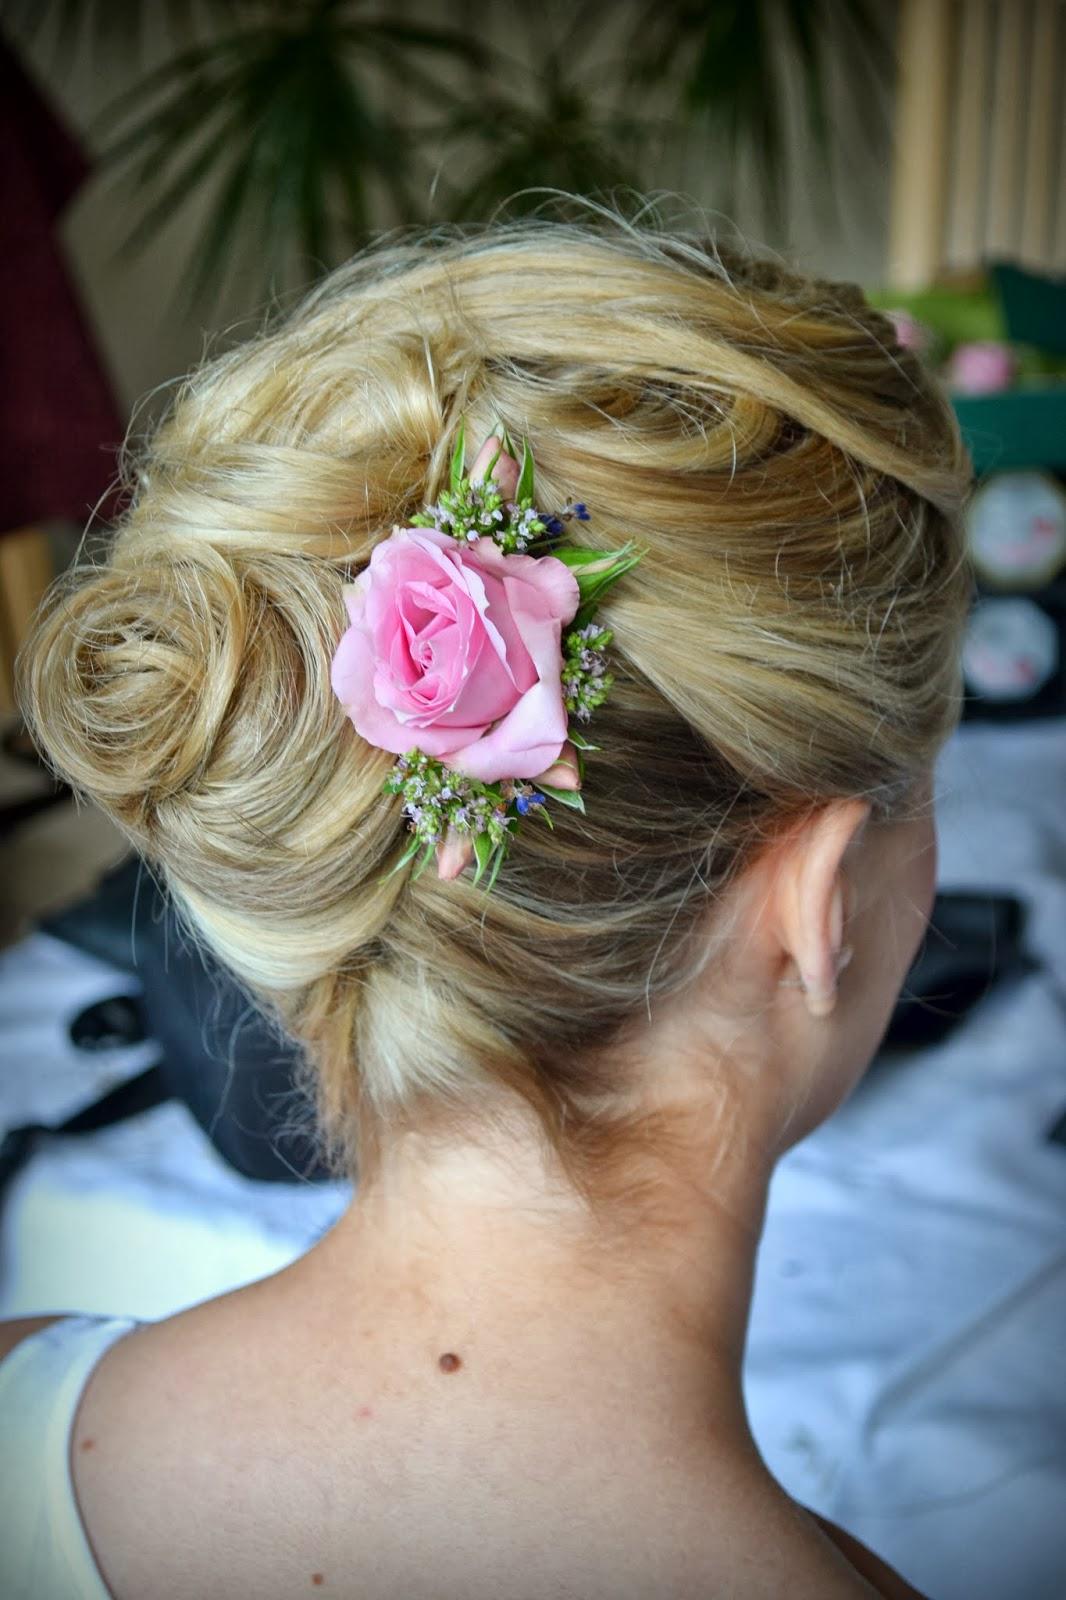 fordham hair design  wedding bridal hair specialist: october 2013